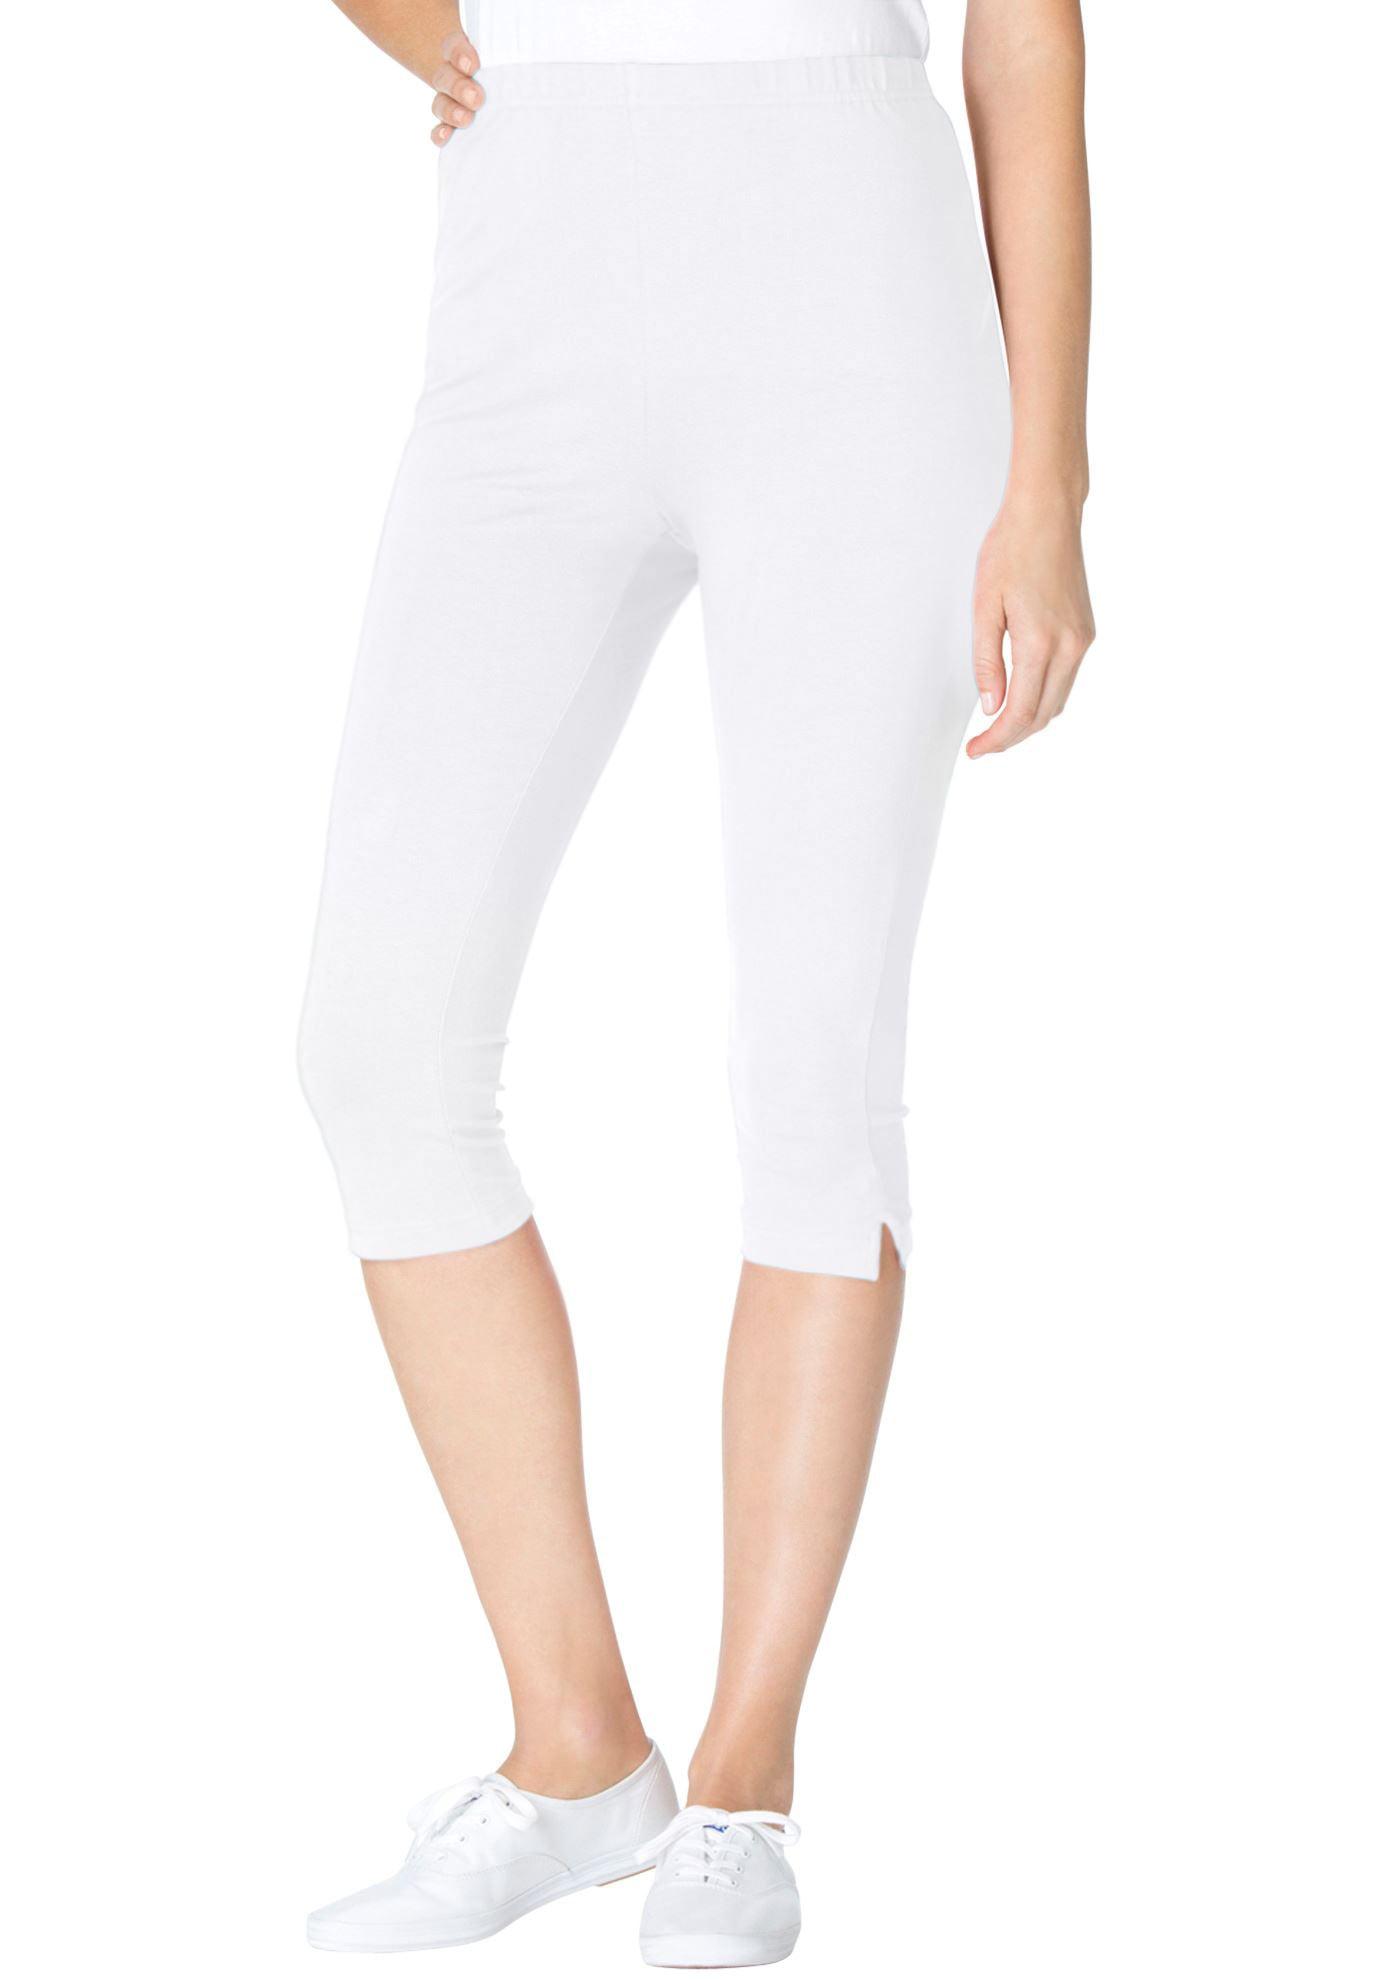 Woman Within Plus Size Stretch Cotton Capri Legging